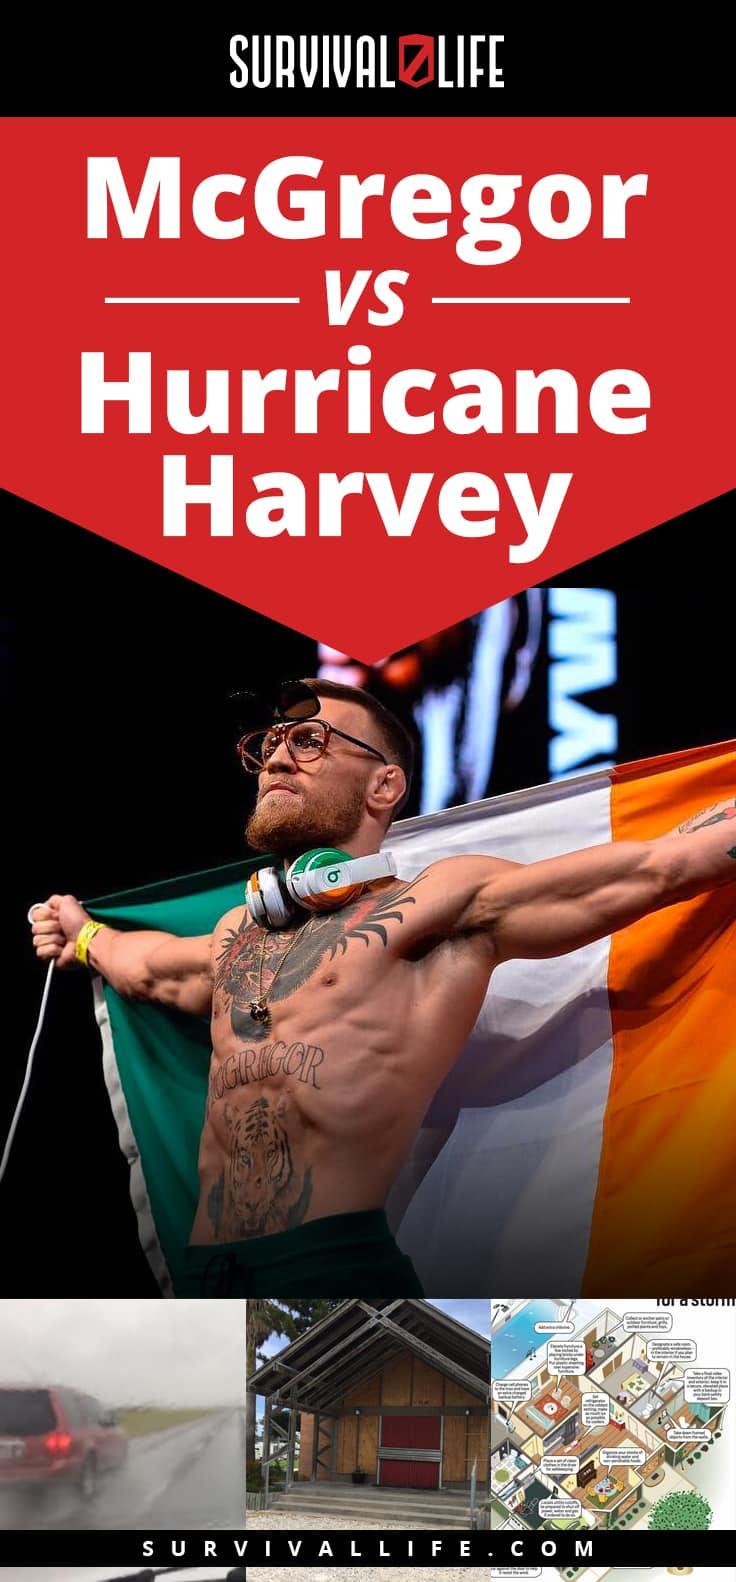 McGregor vs Hurricane Harvey